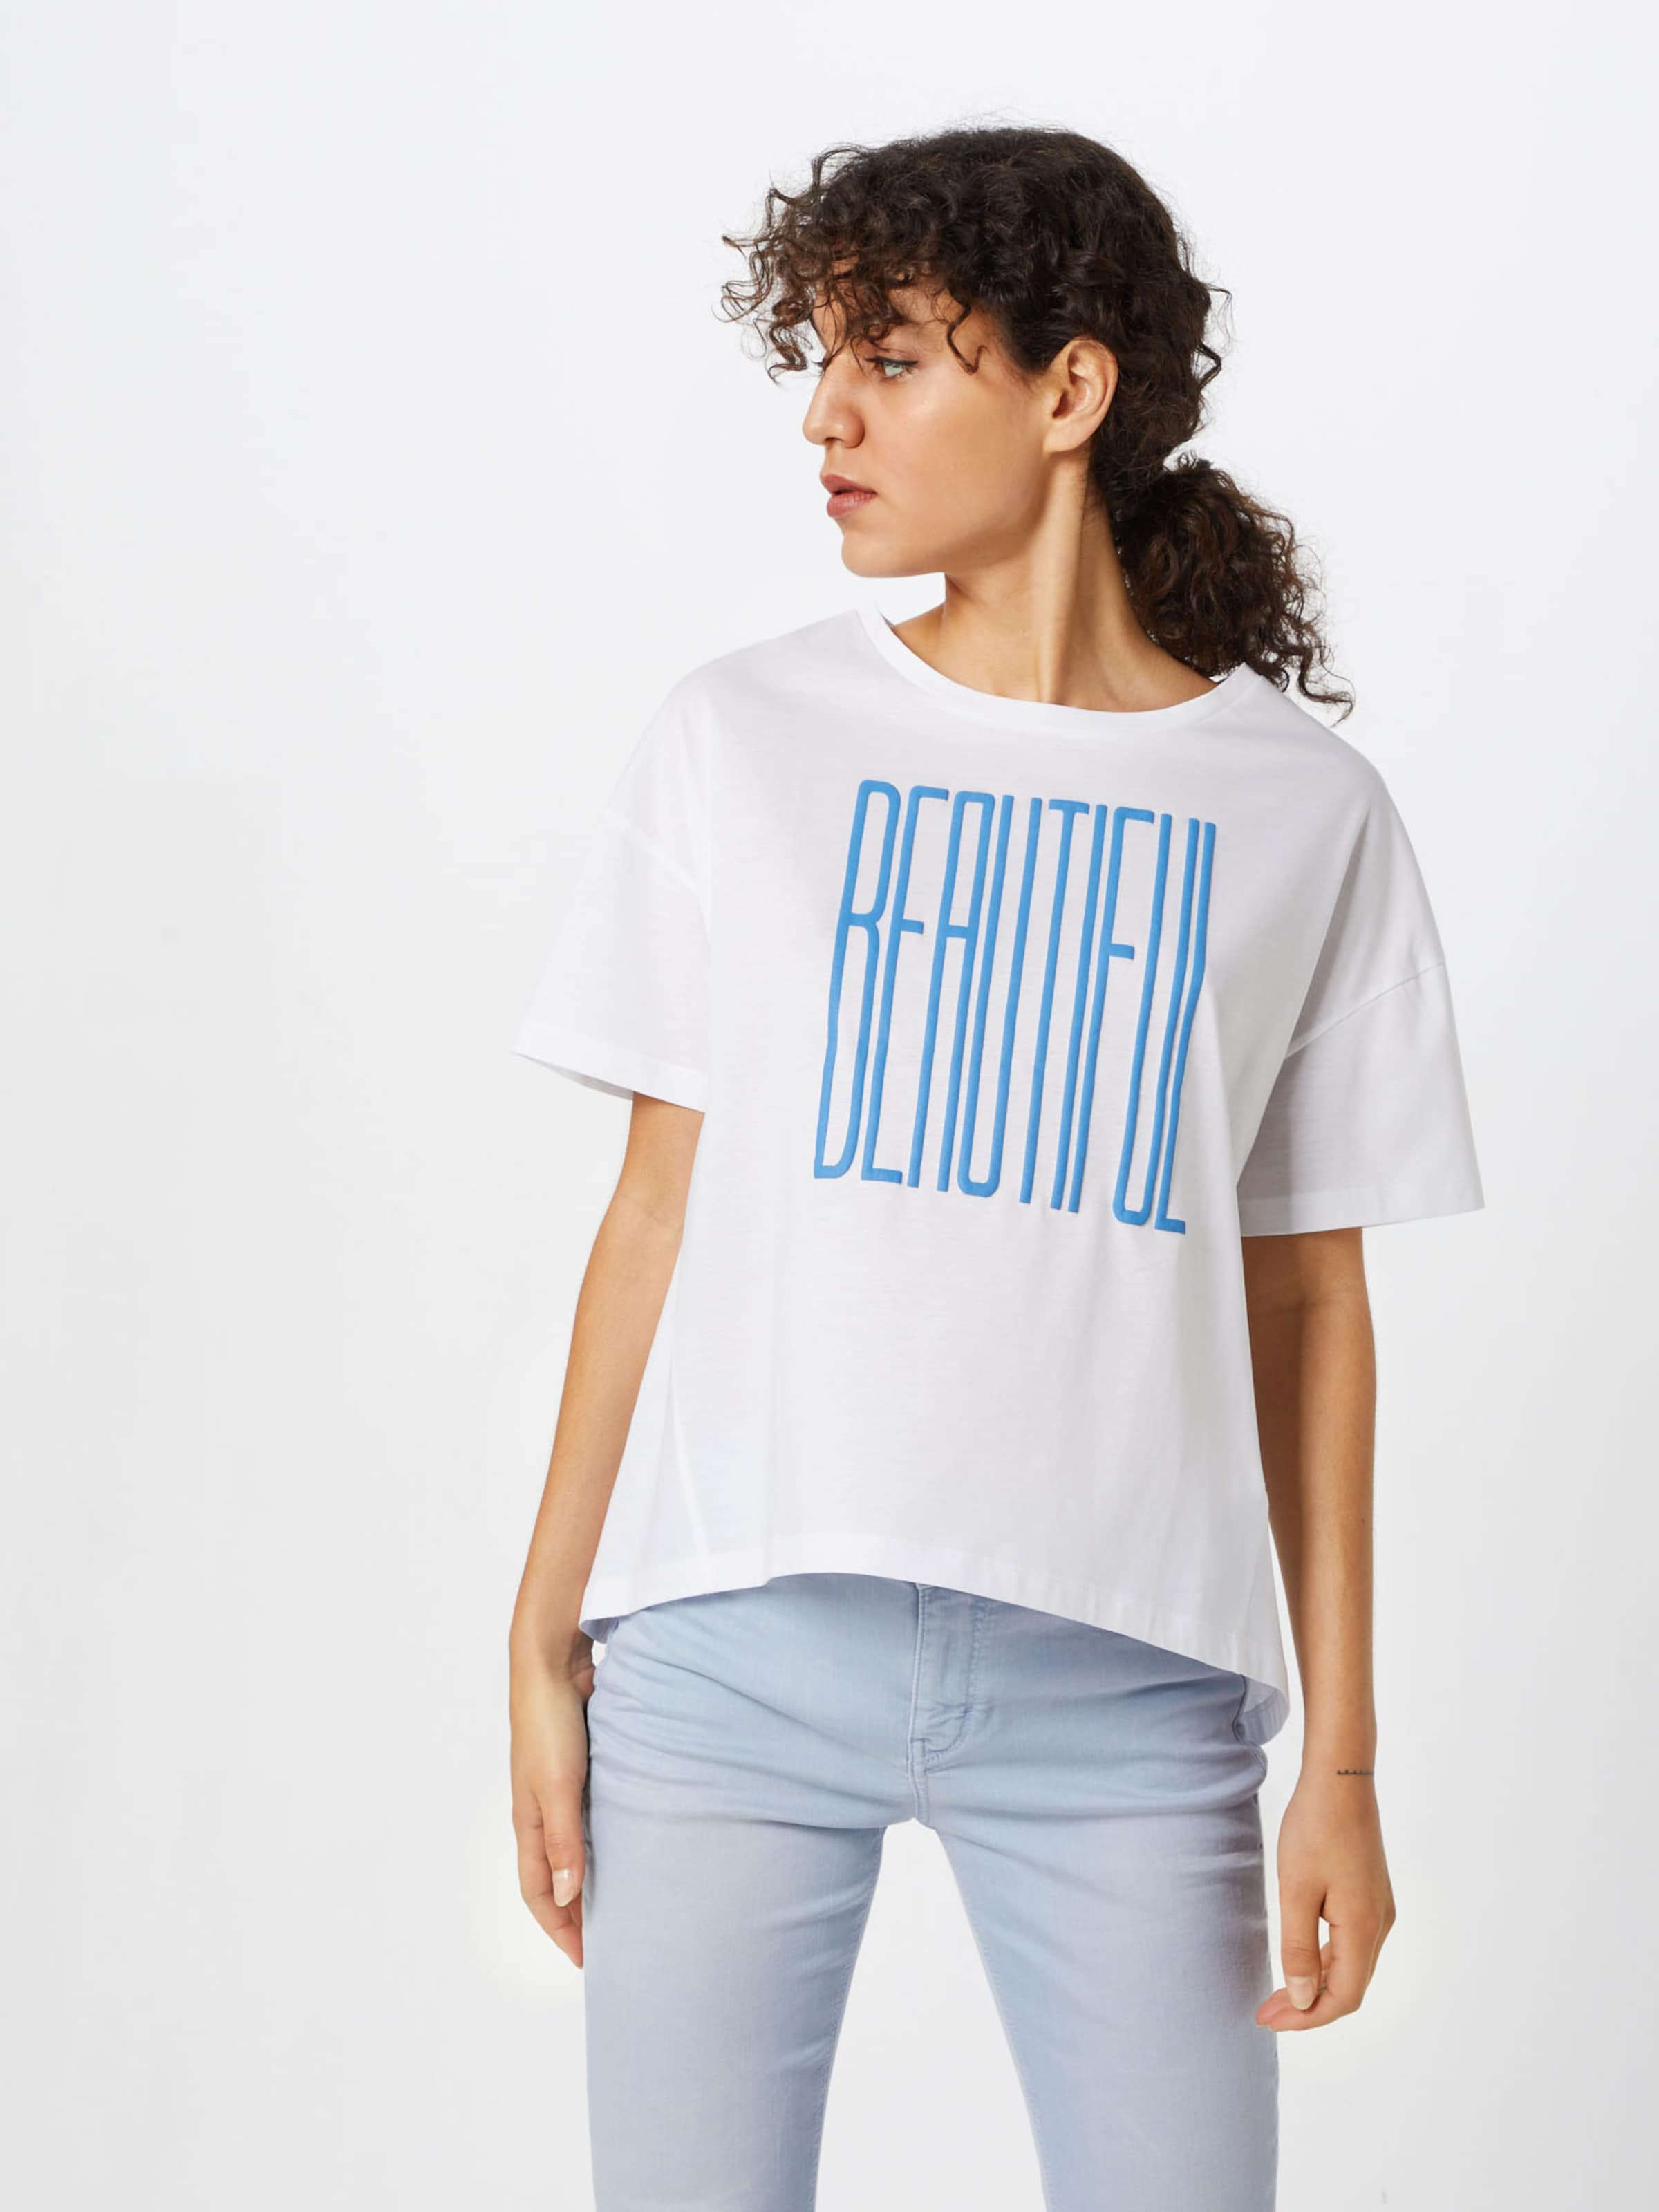 In p5' Drykorn Shirt Weiß 'santje AR5jqL34